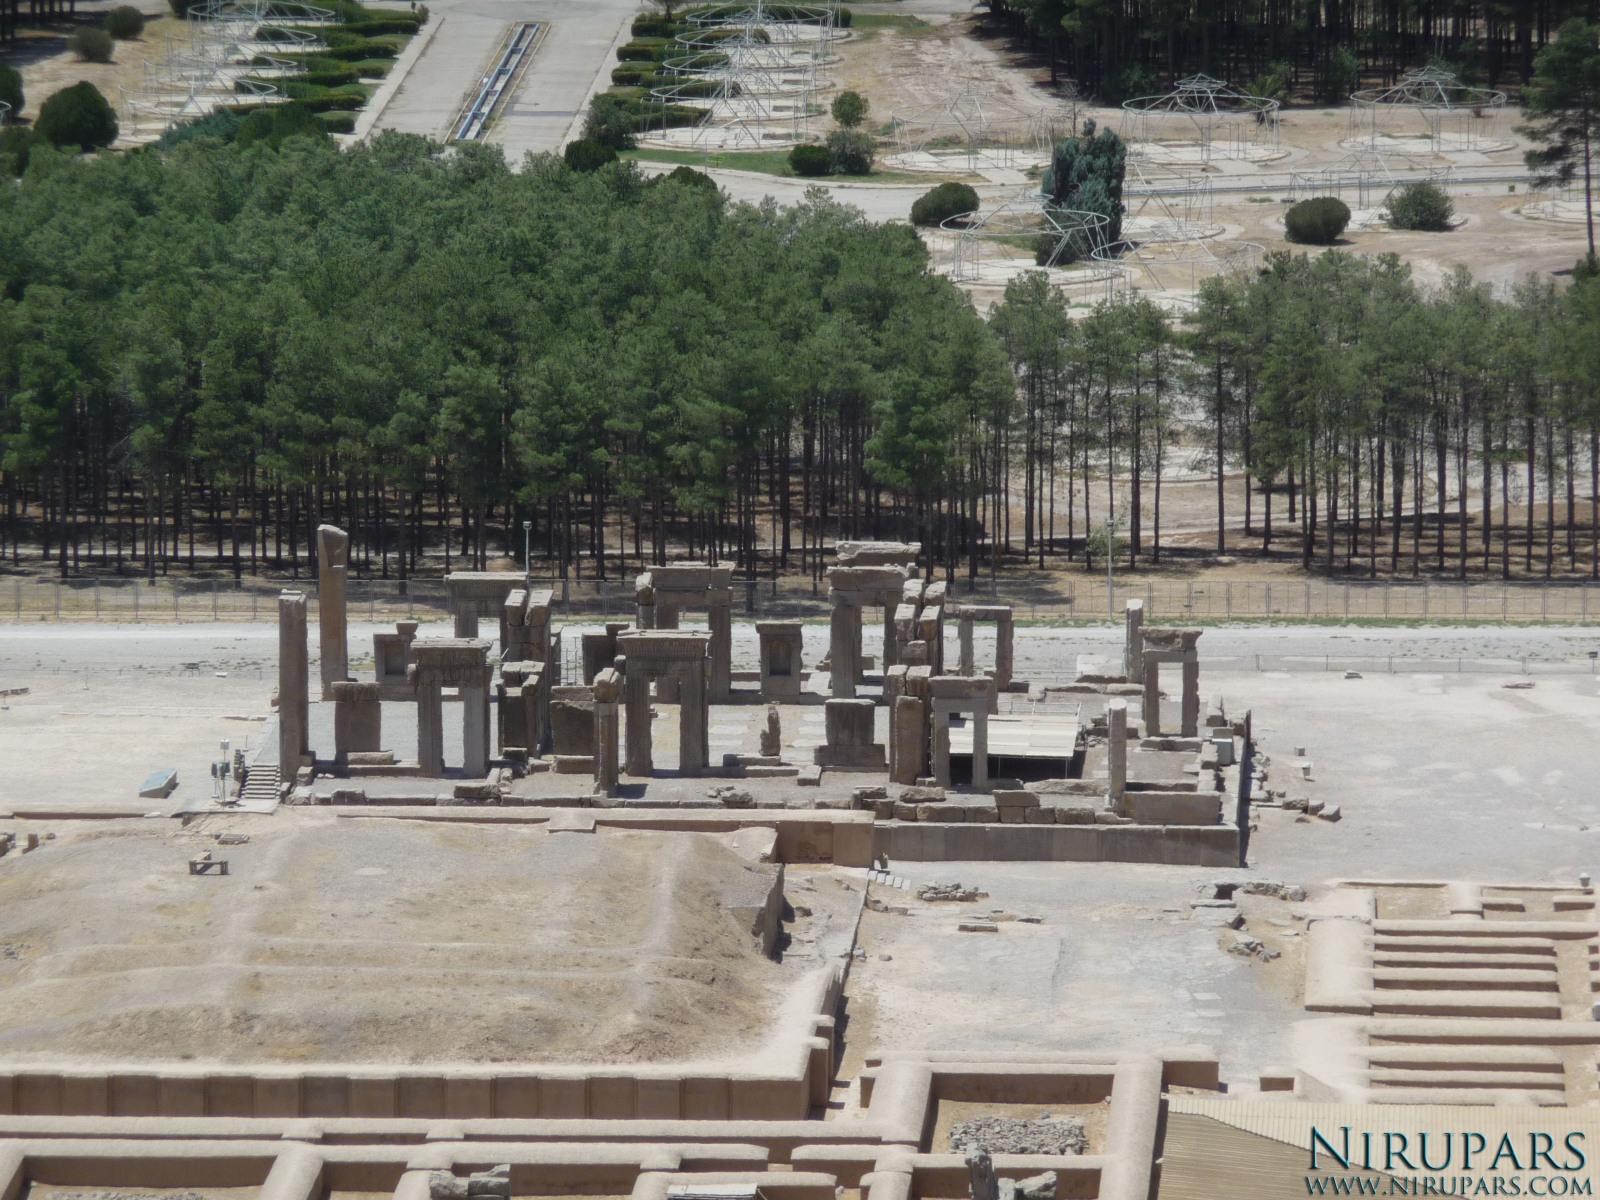 Persepolis - Tachara Palace